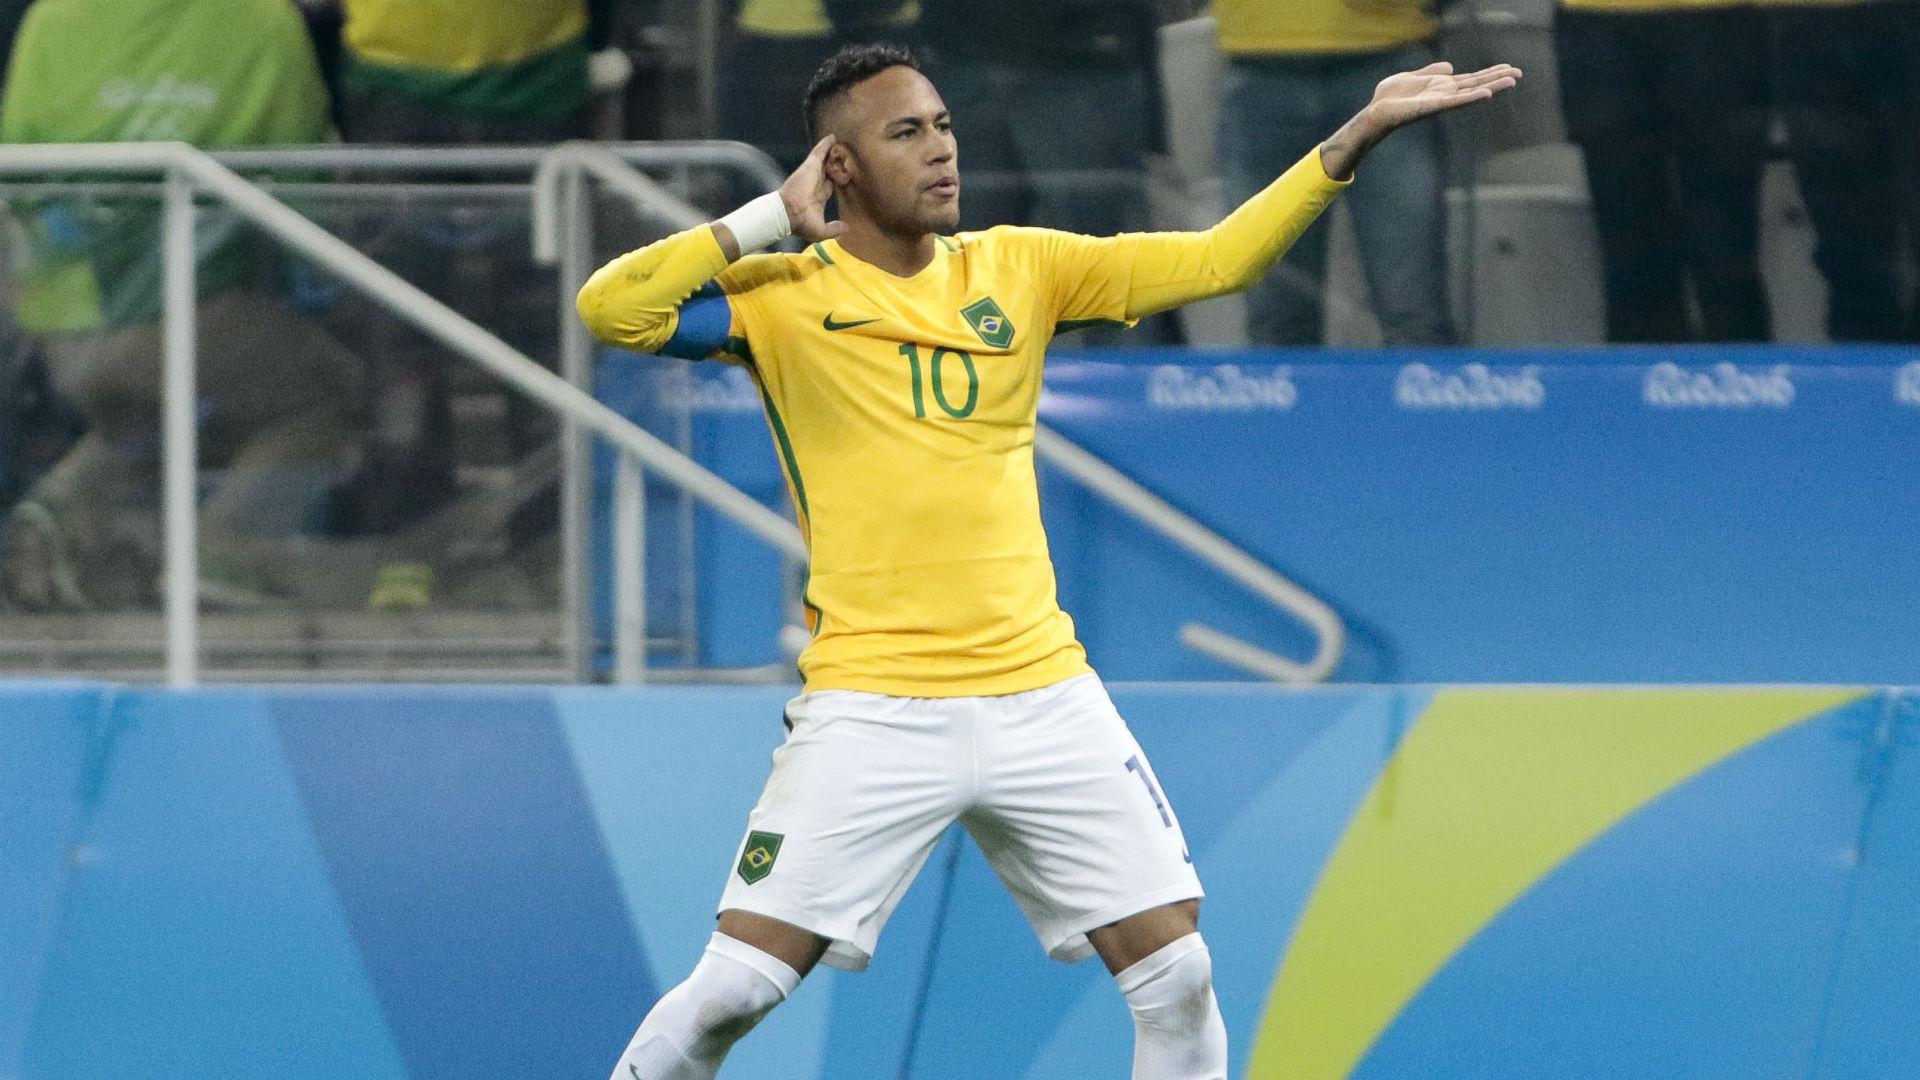 Video: U23 Brazil vs U23 Colombia